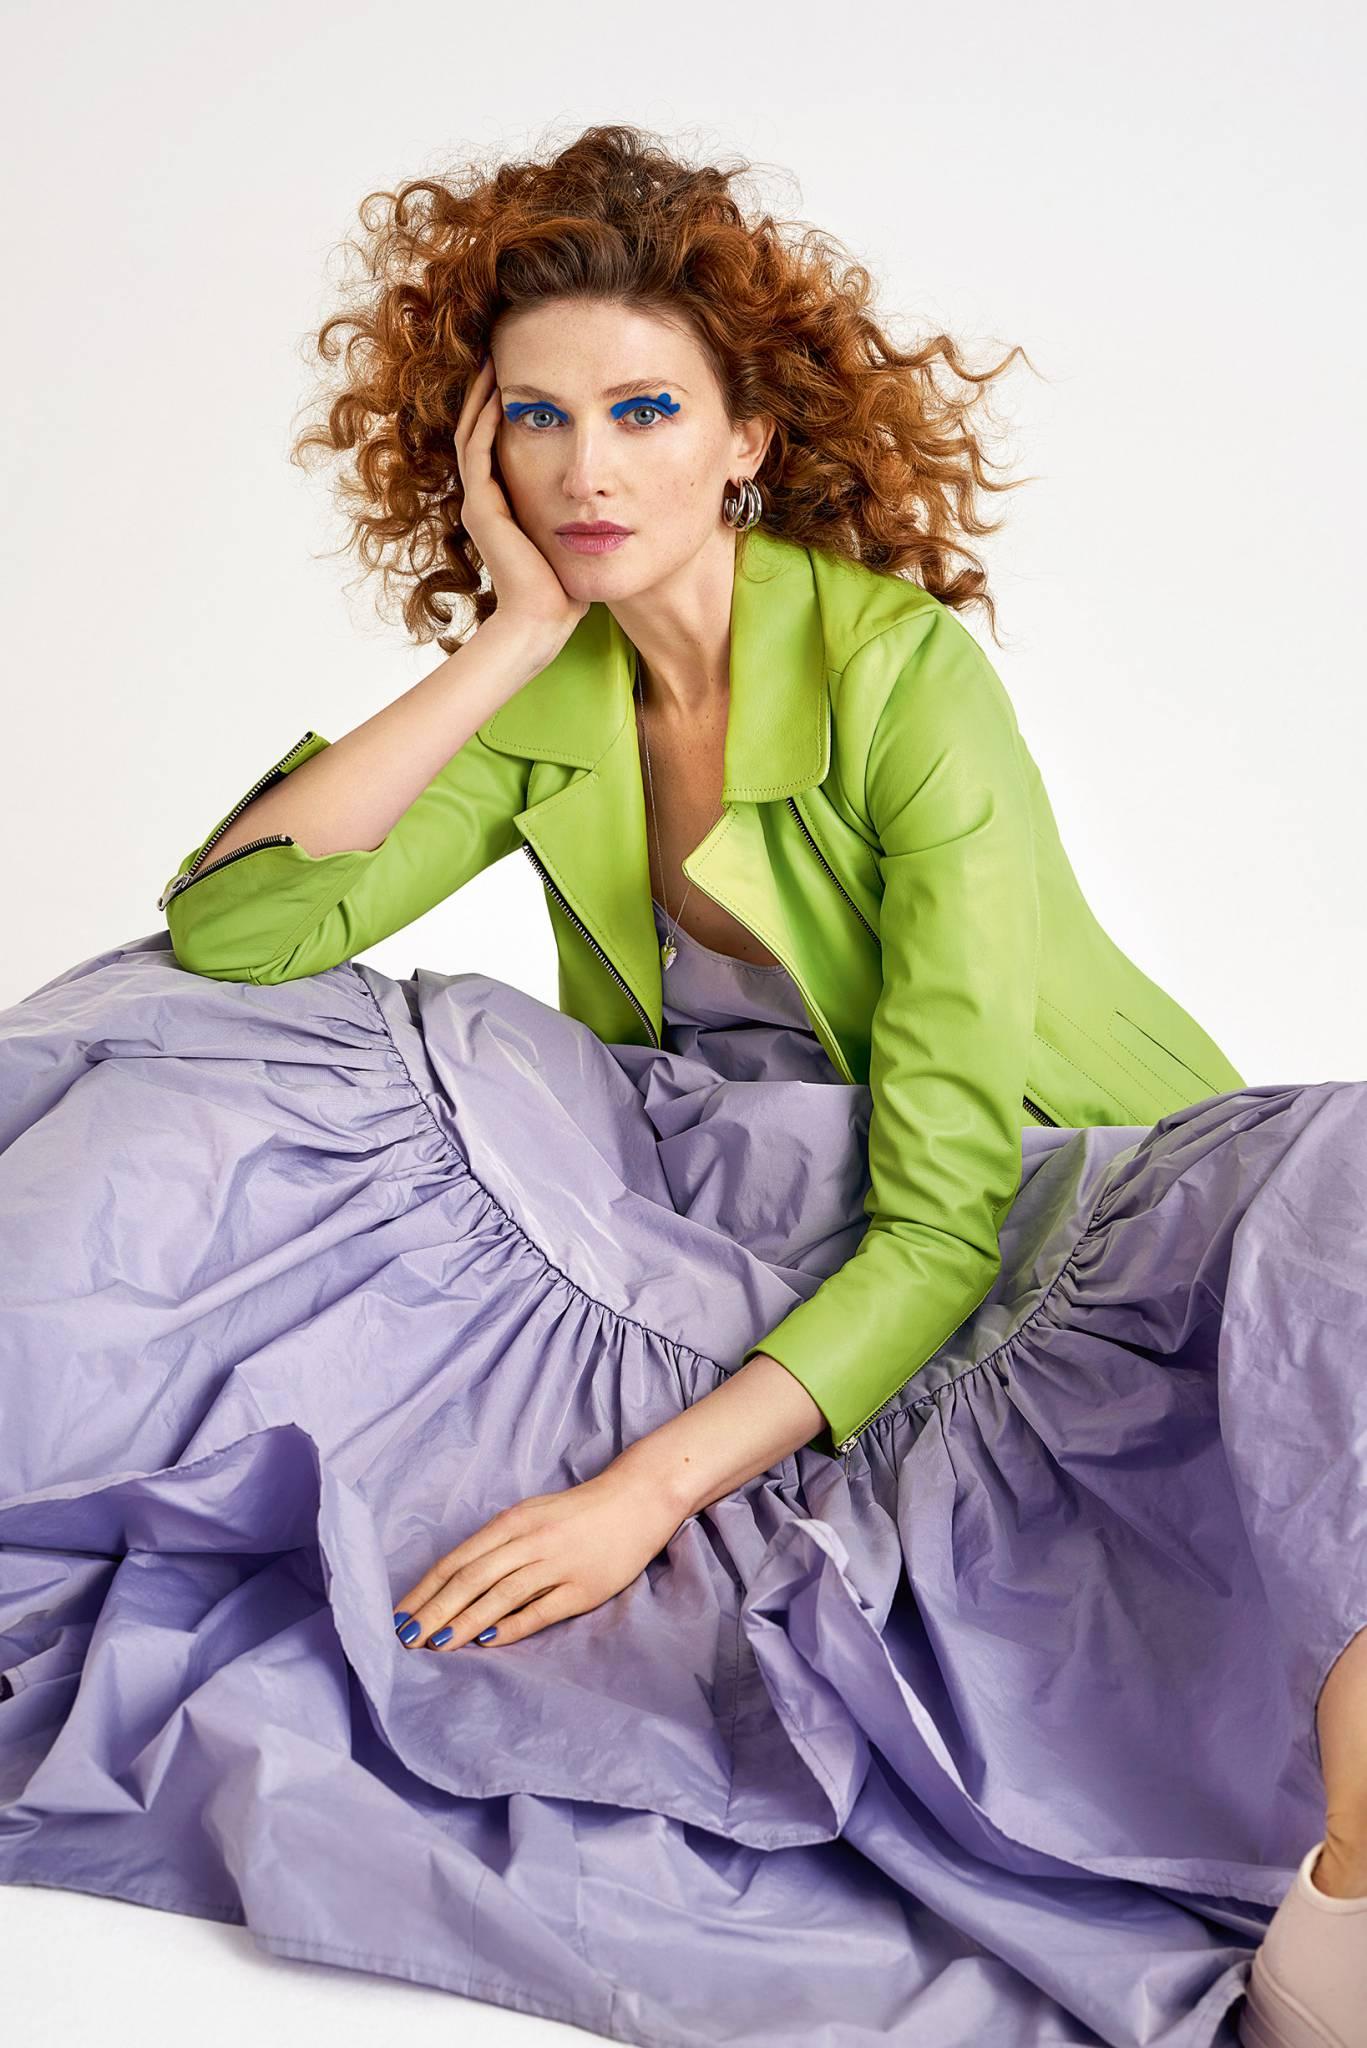 Koloroterapia - moda pełna barw